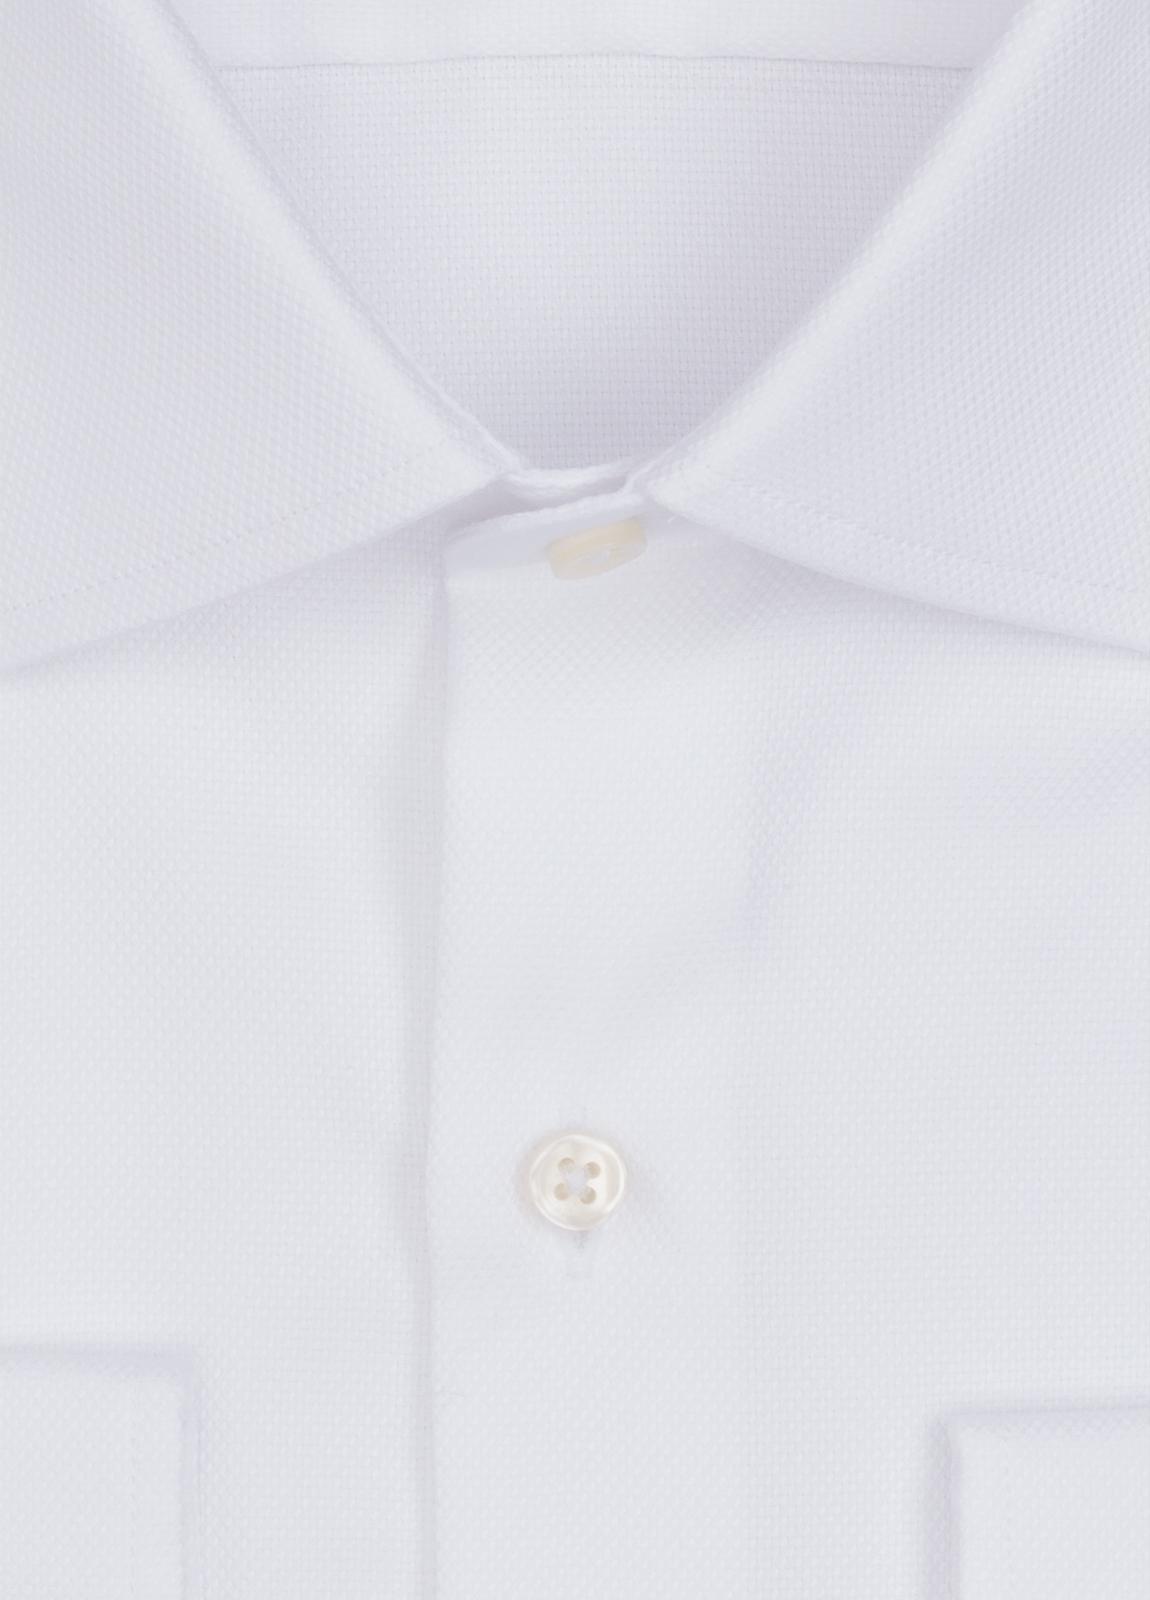 Camisa Formal Wear SLIM FIT cuello italiano modelo ROMA microtextura color blanco. 100% Algodón. - Ítem1